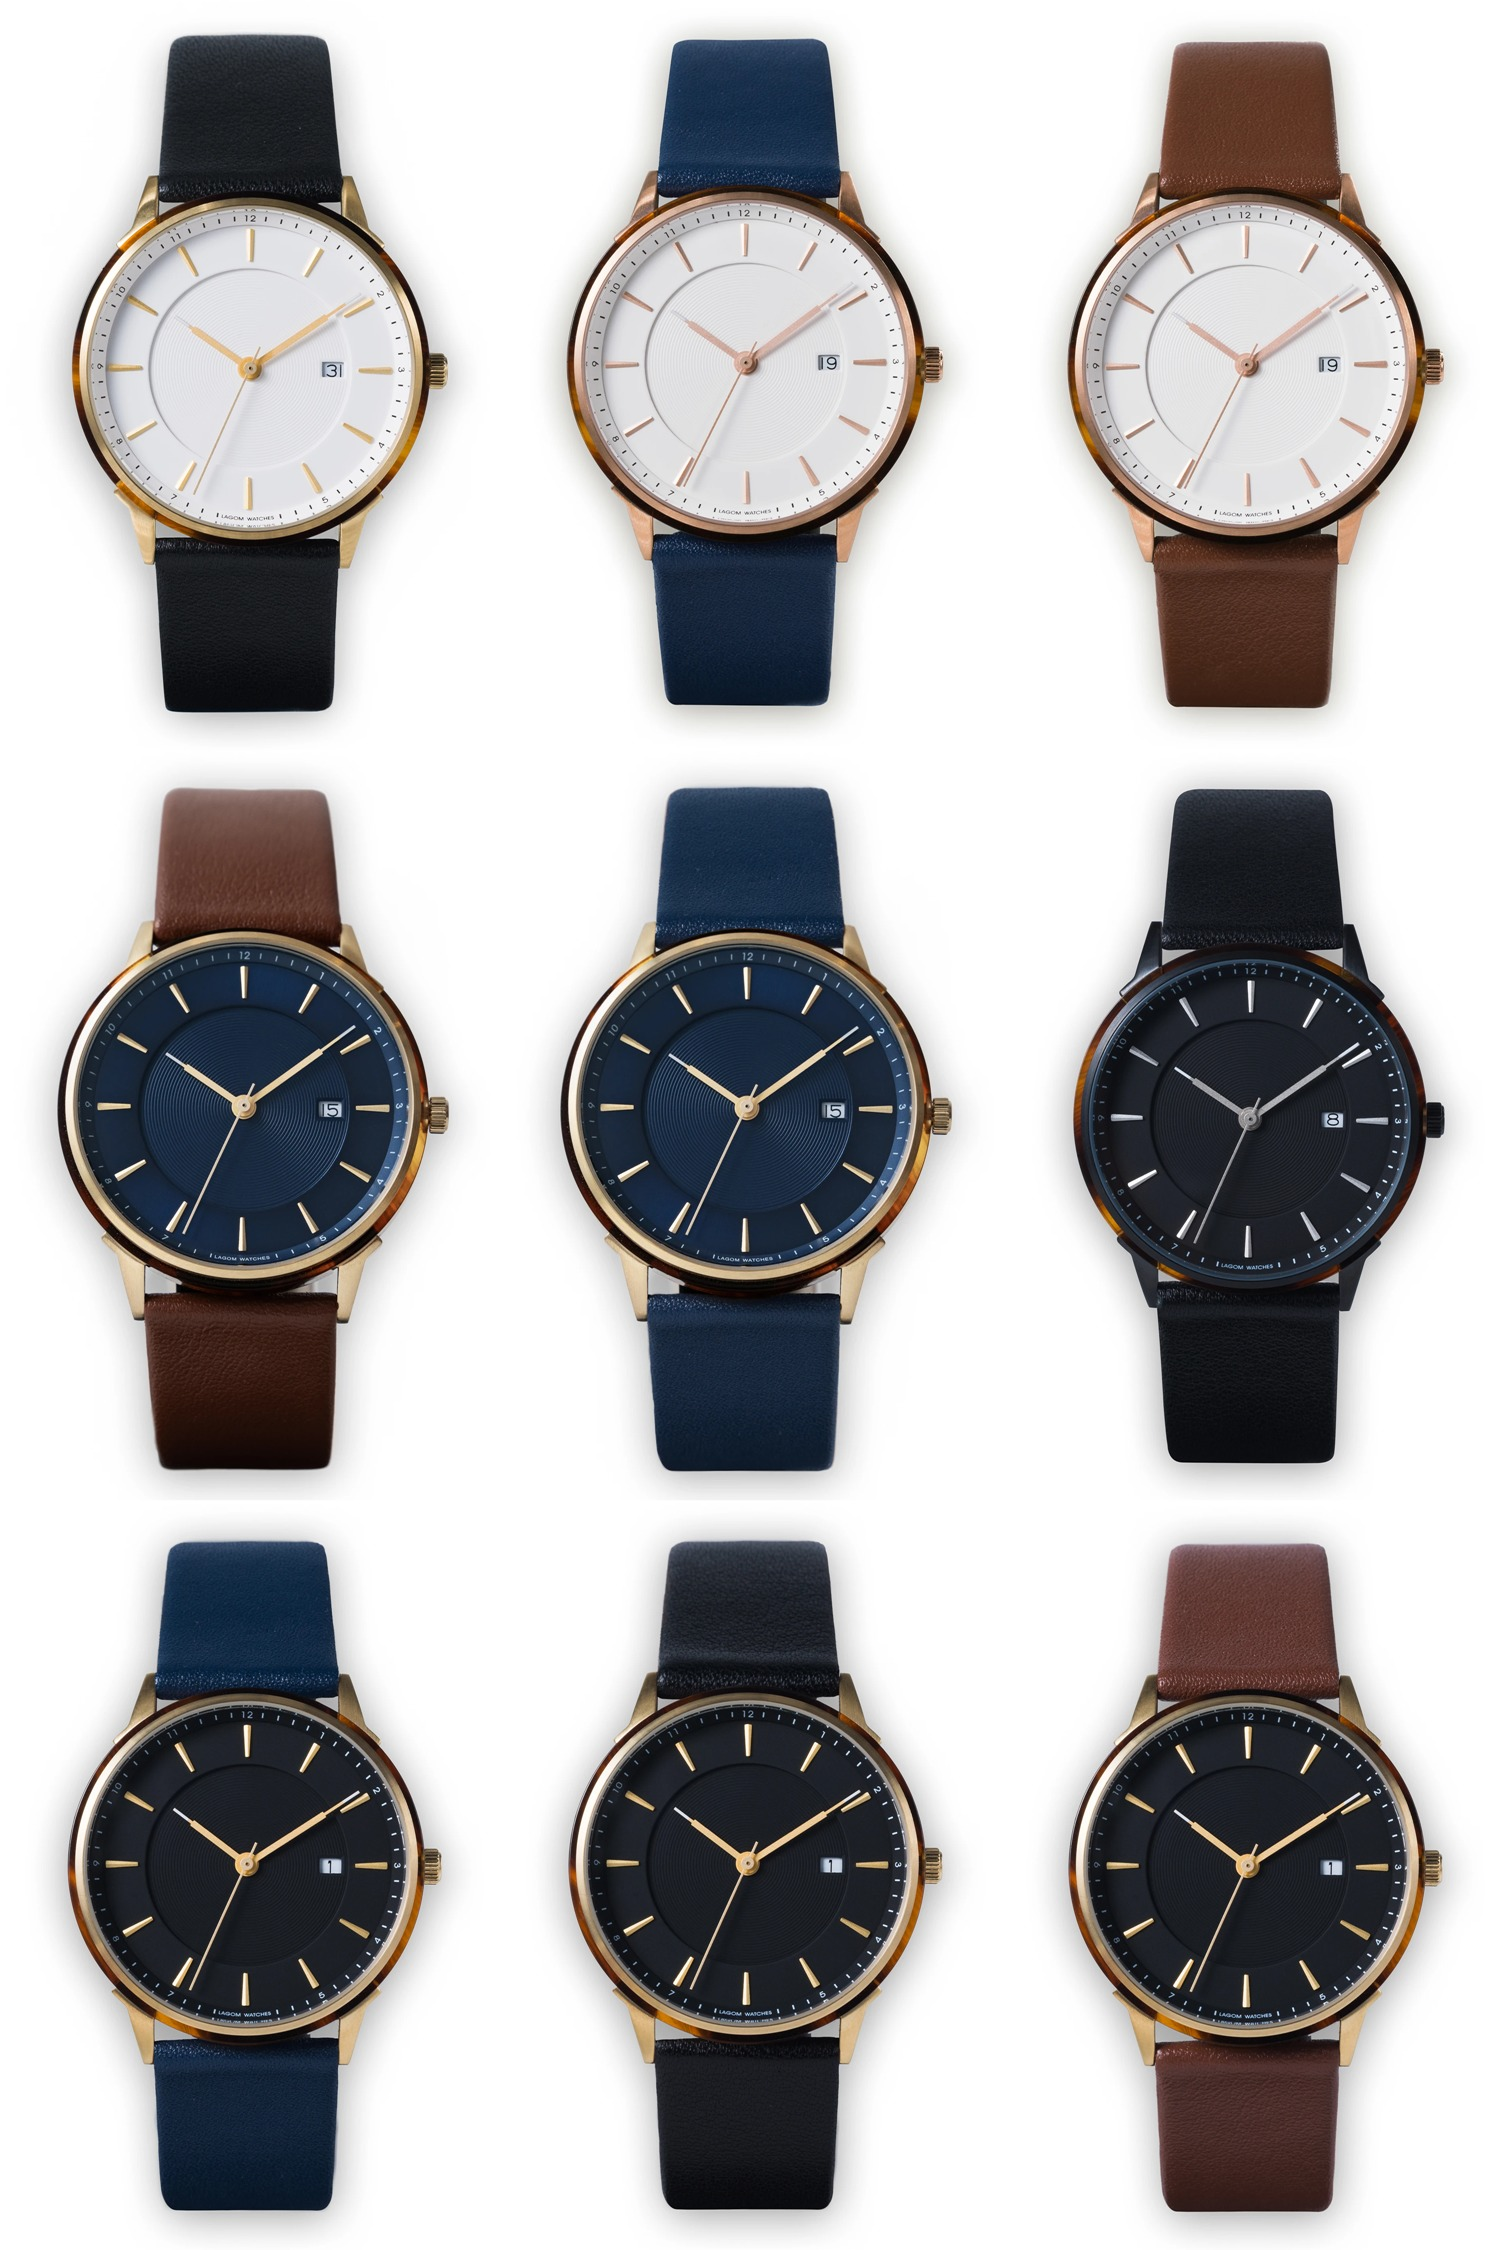 Lagom Watches(ラーゴムウォッチ)BORJA カラーバリエーション ブラック ネイビー ブラウン ストラップ